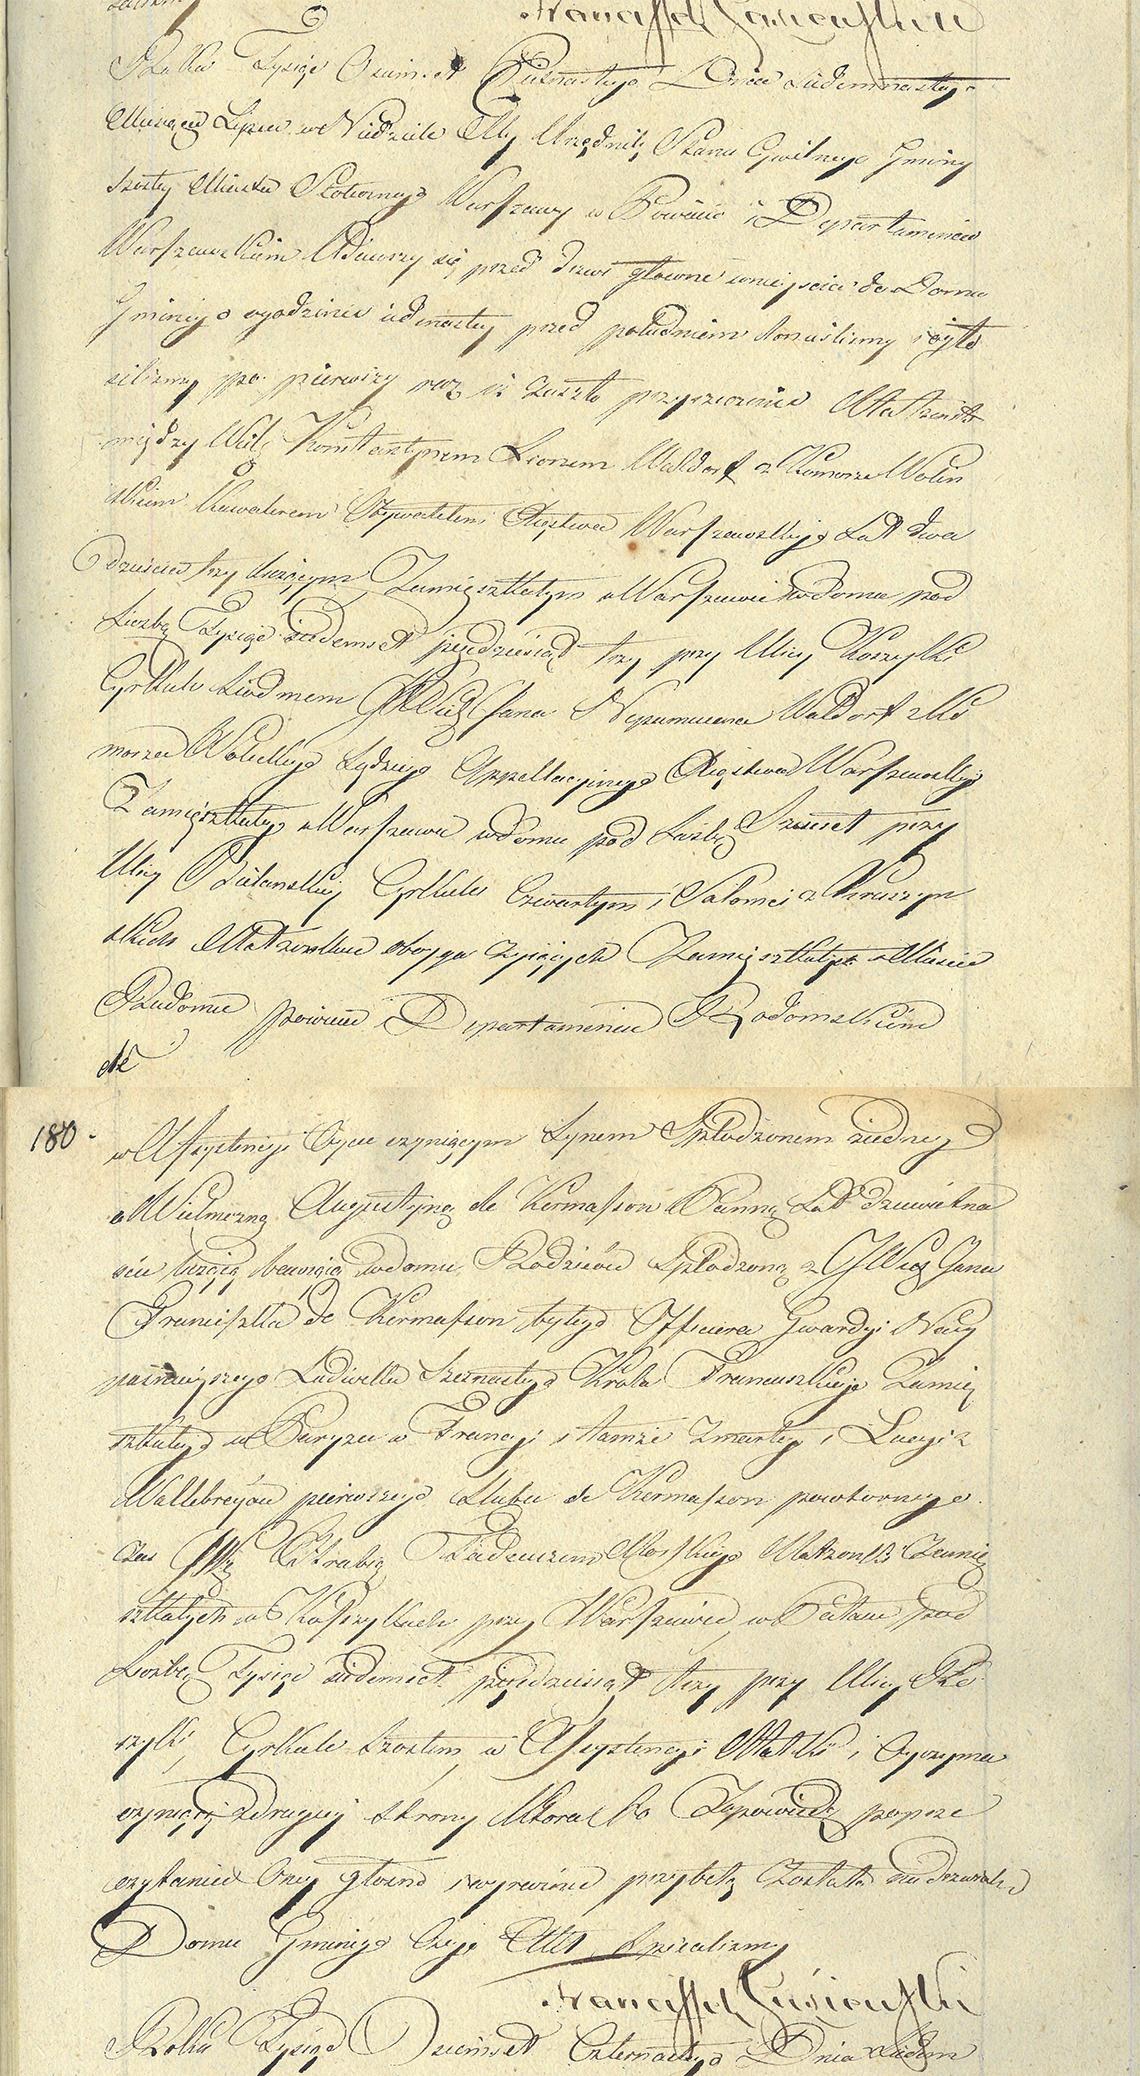 Akt zapowiedzi małżeństwa Konstantyn Leon Wolicki & Augustyna de Kermasson 14.07.1814 r.